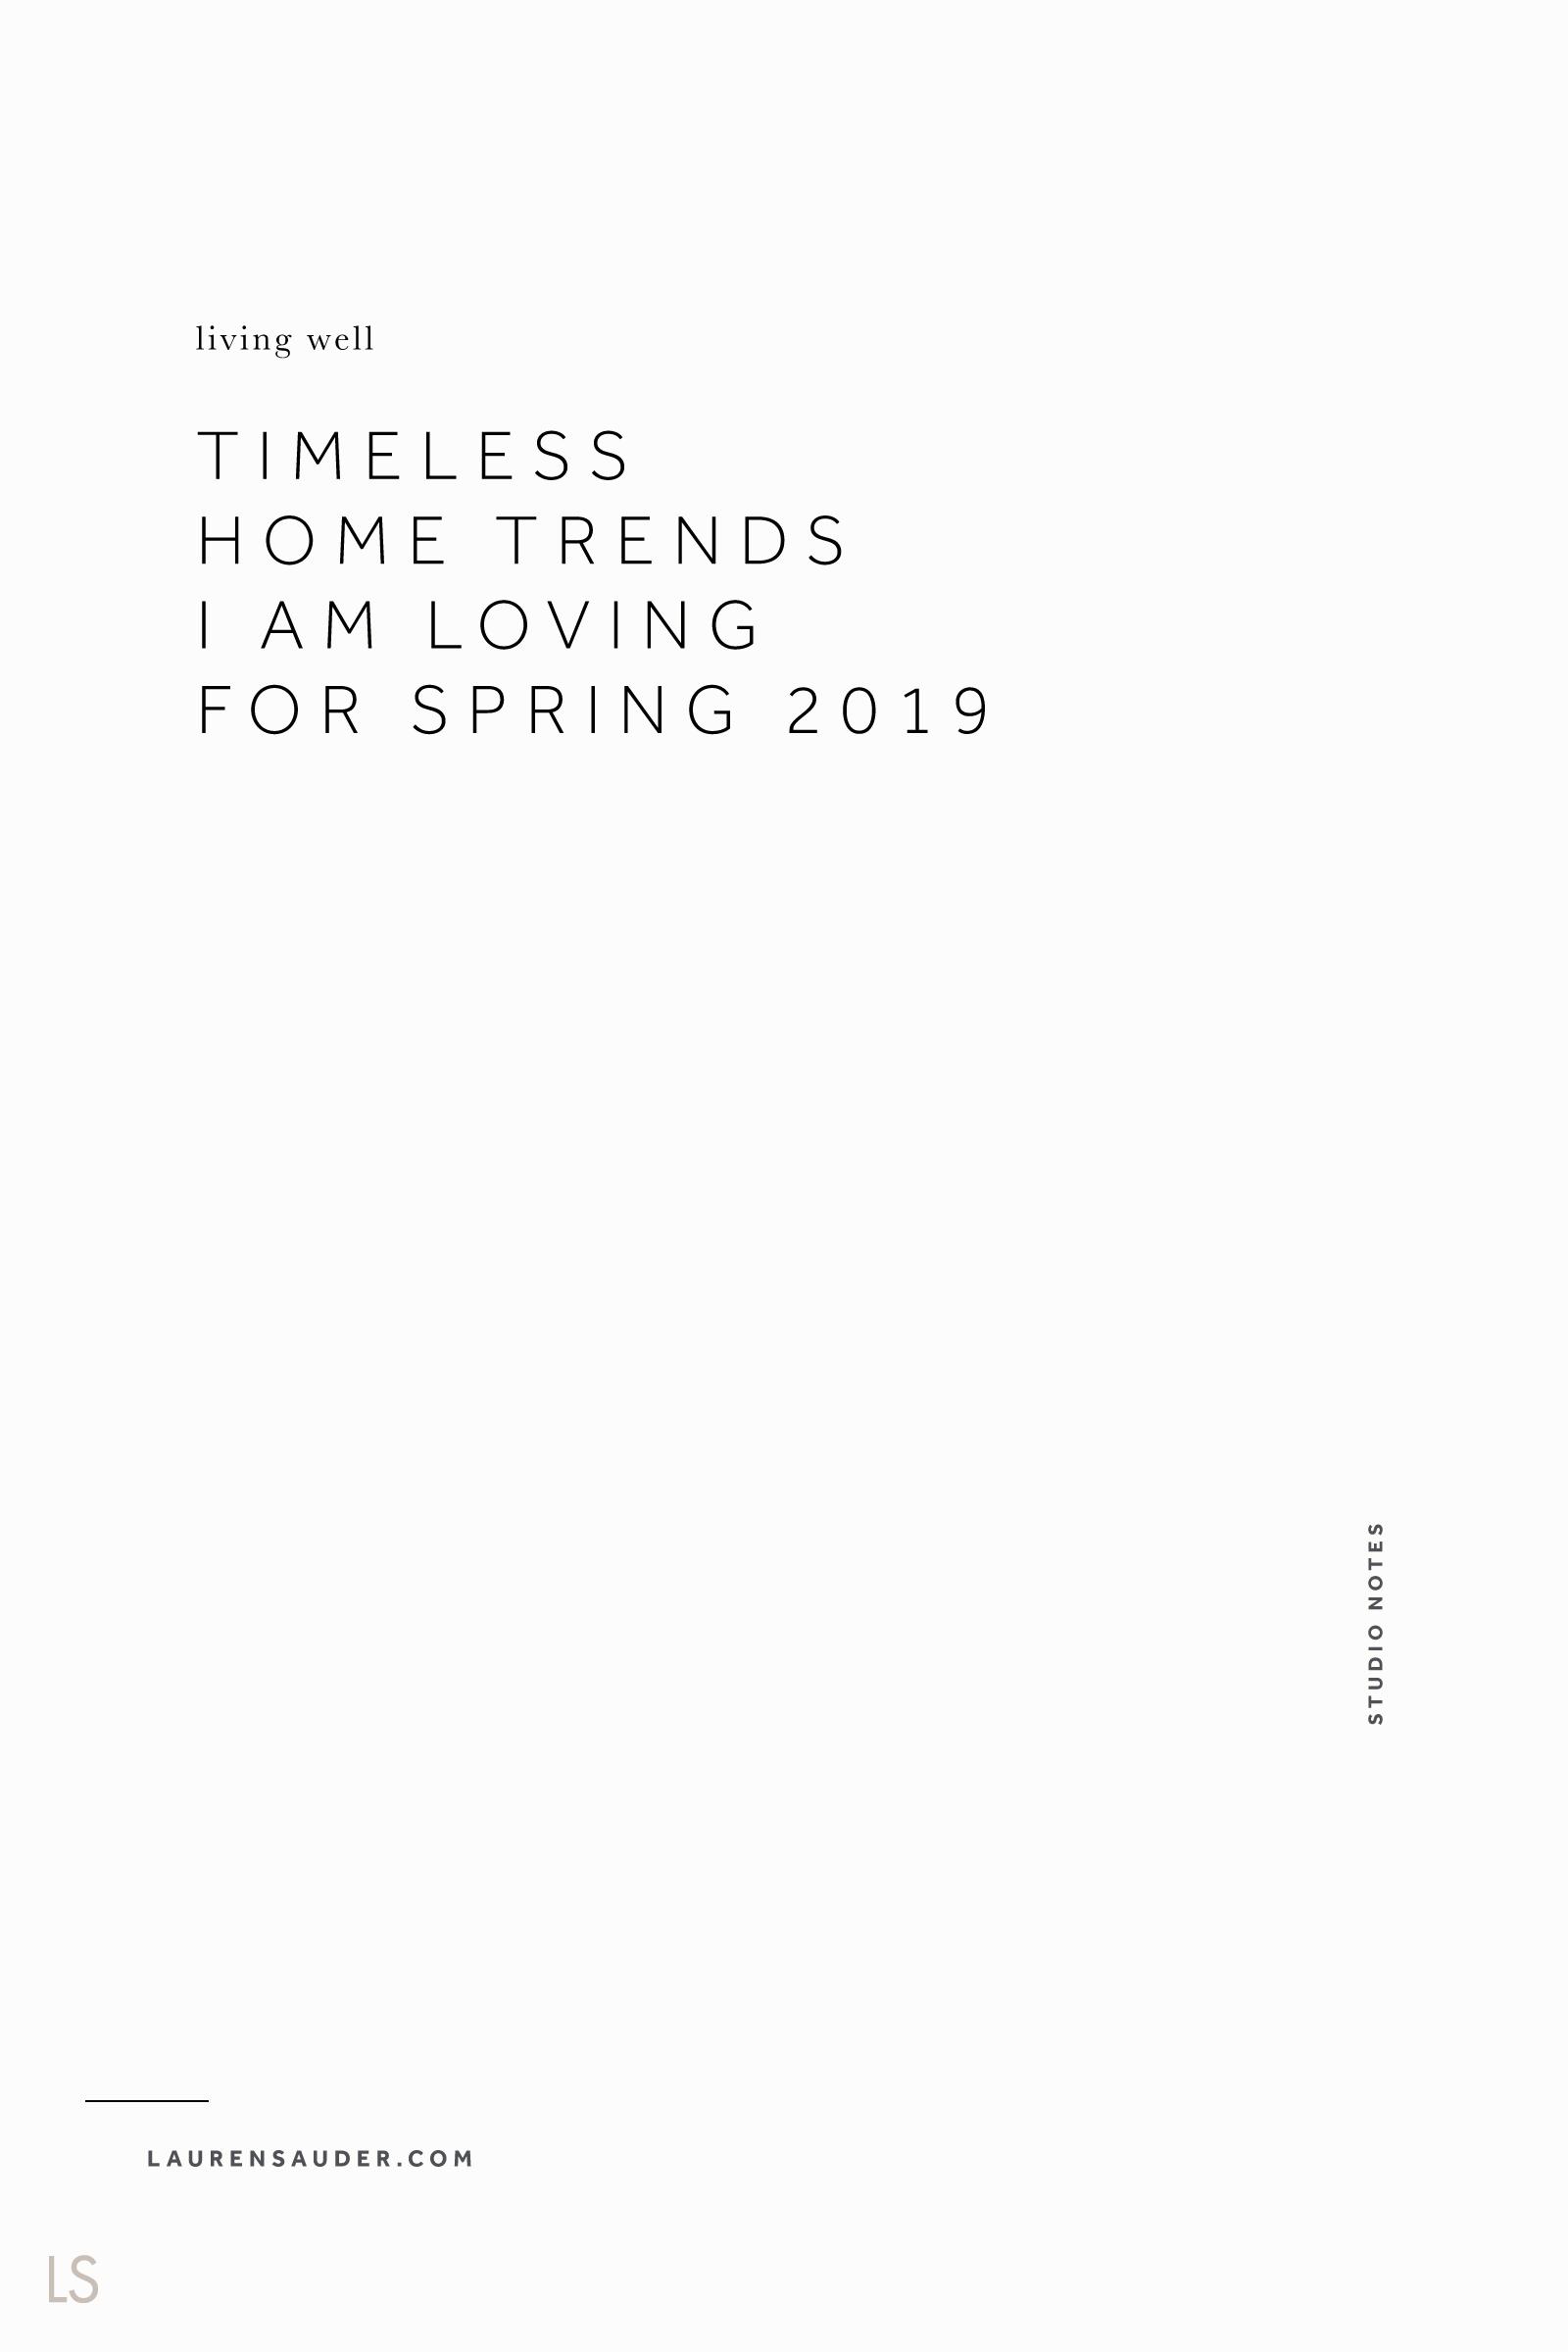 Timeless Home Trends I am Loving for Spring 2019 - Lauren Sauder intentional living space, home, interior decor, interior design, home trends, spring 2019